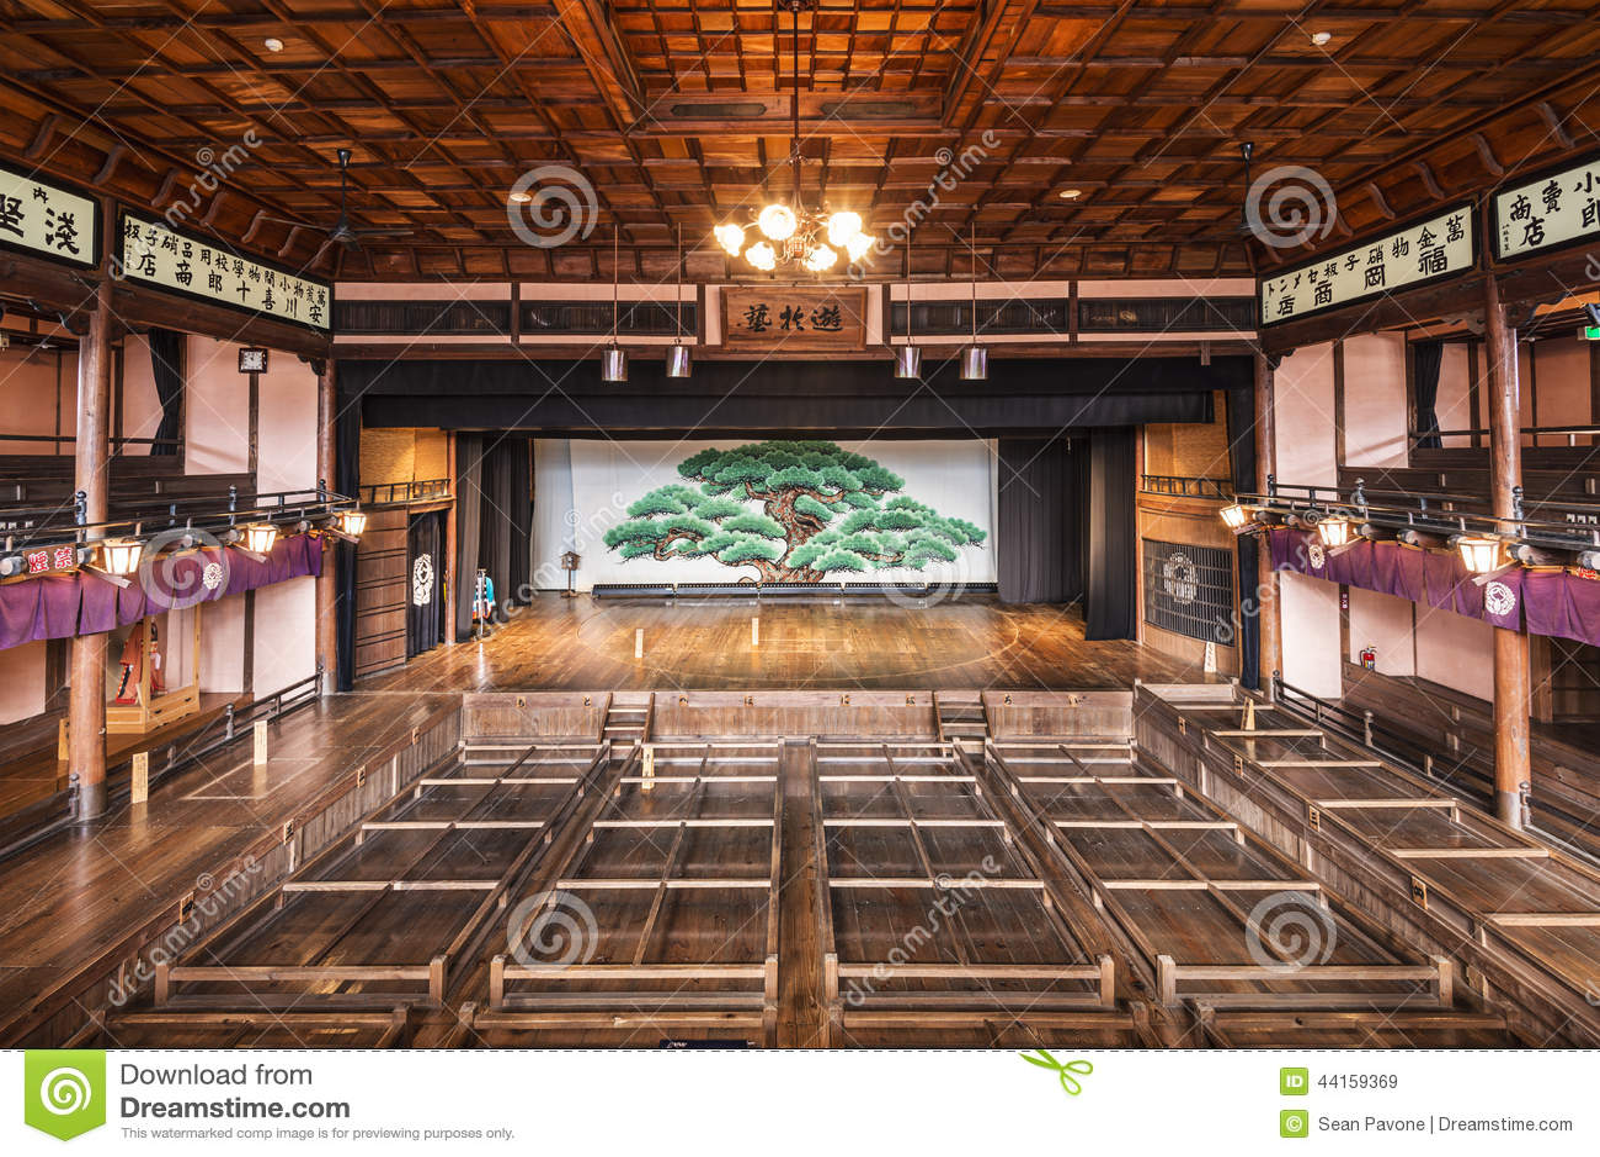 Kabuki architecture